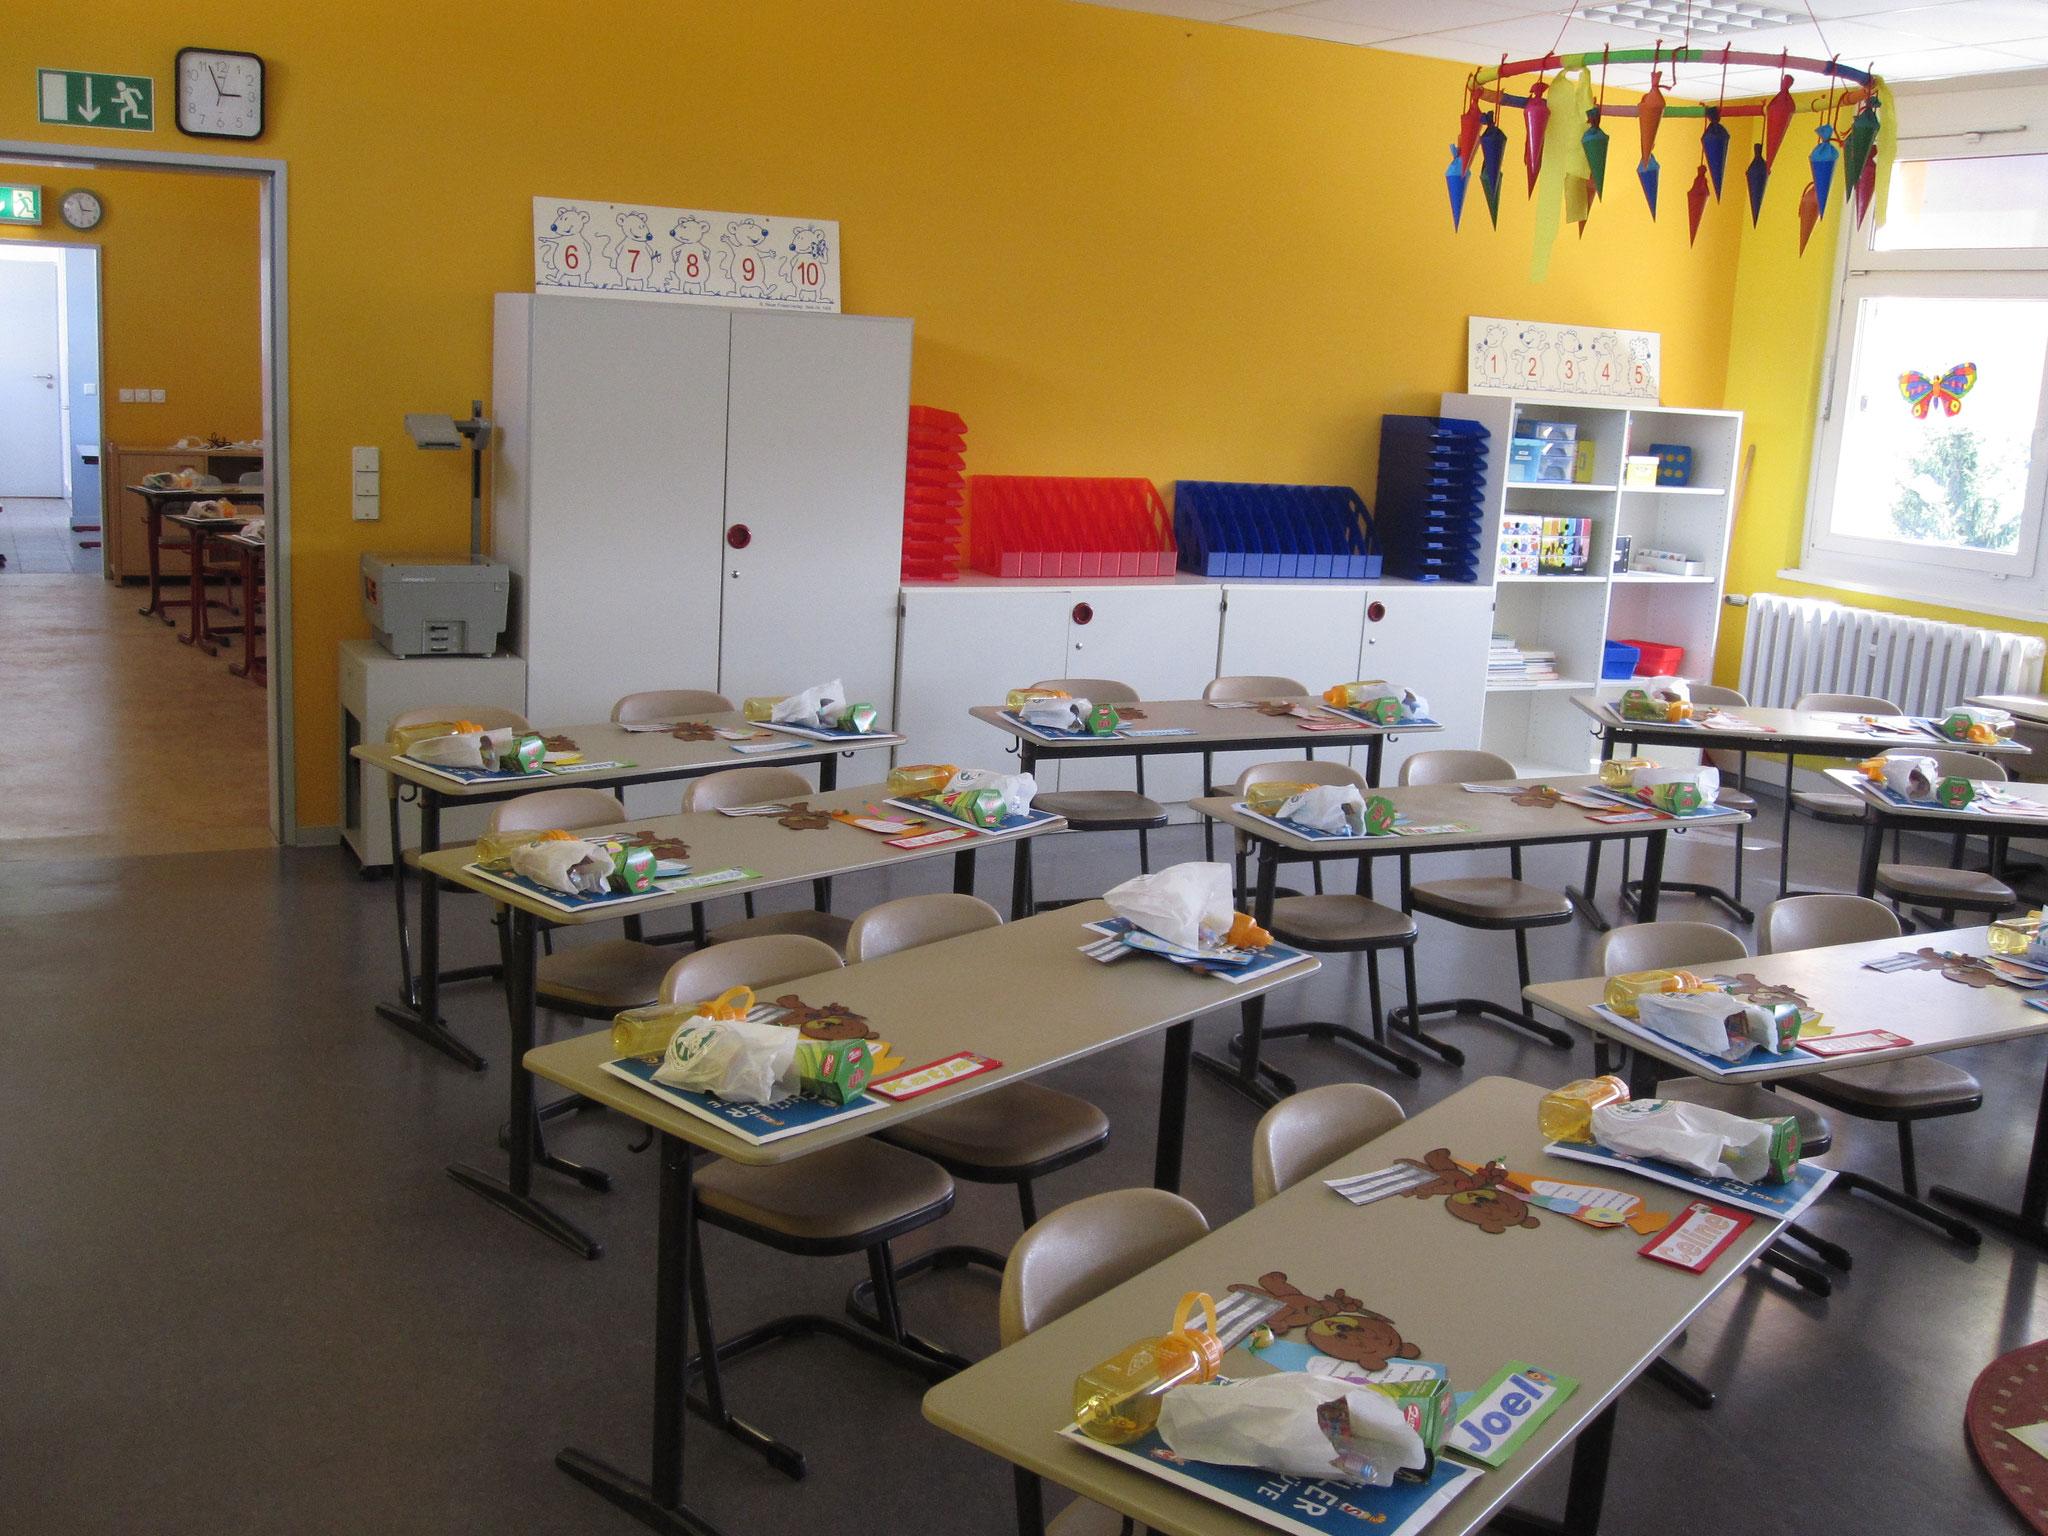 Der Klassenraum einer 1. Klasse